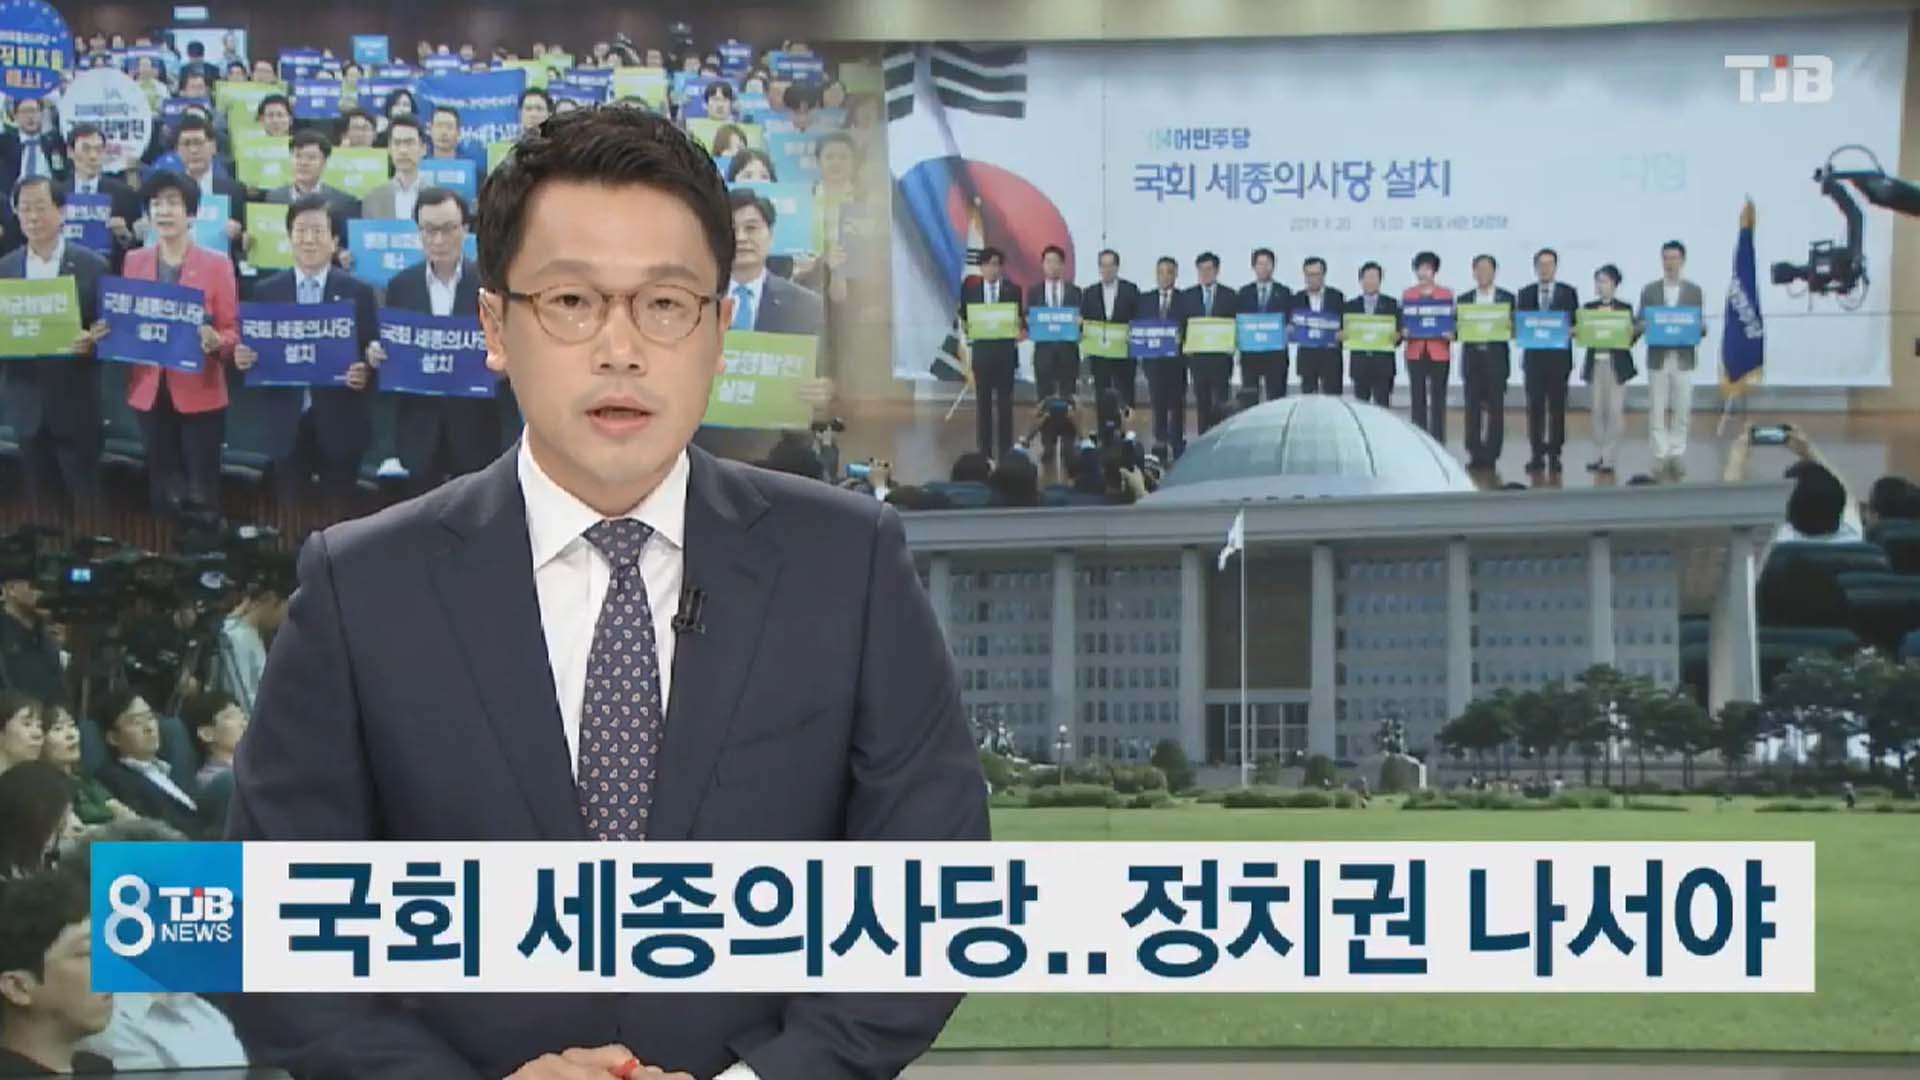 [TJB뉴스] 국회 세종의사당,여야 논의 나서야